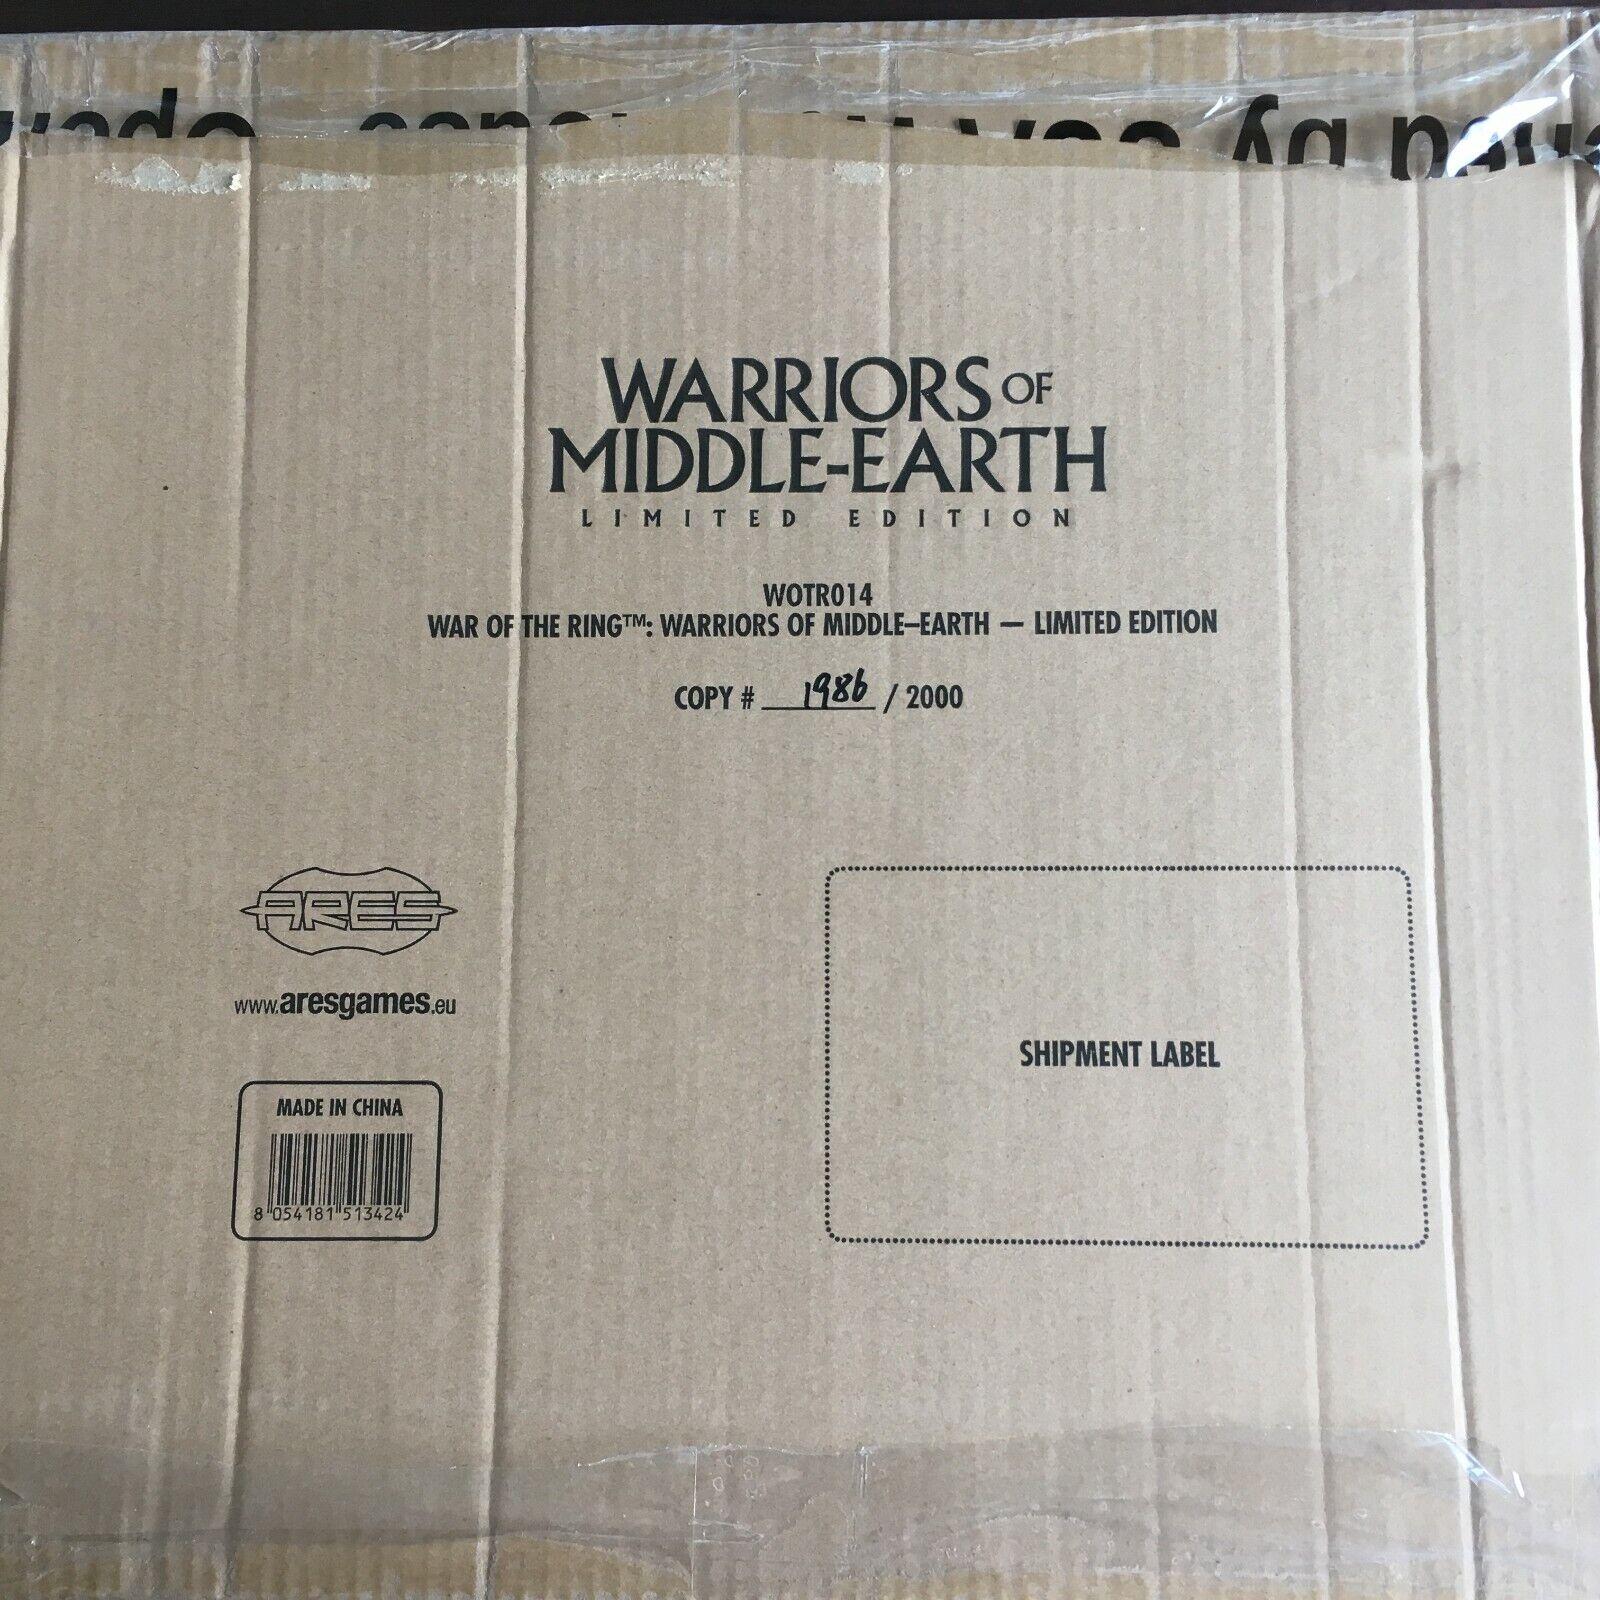 War of the Ring Expansion  Warriors  of Middle Earth Limited edizione bre nuovo  negozio a basso costo